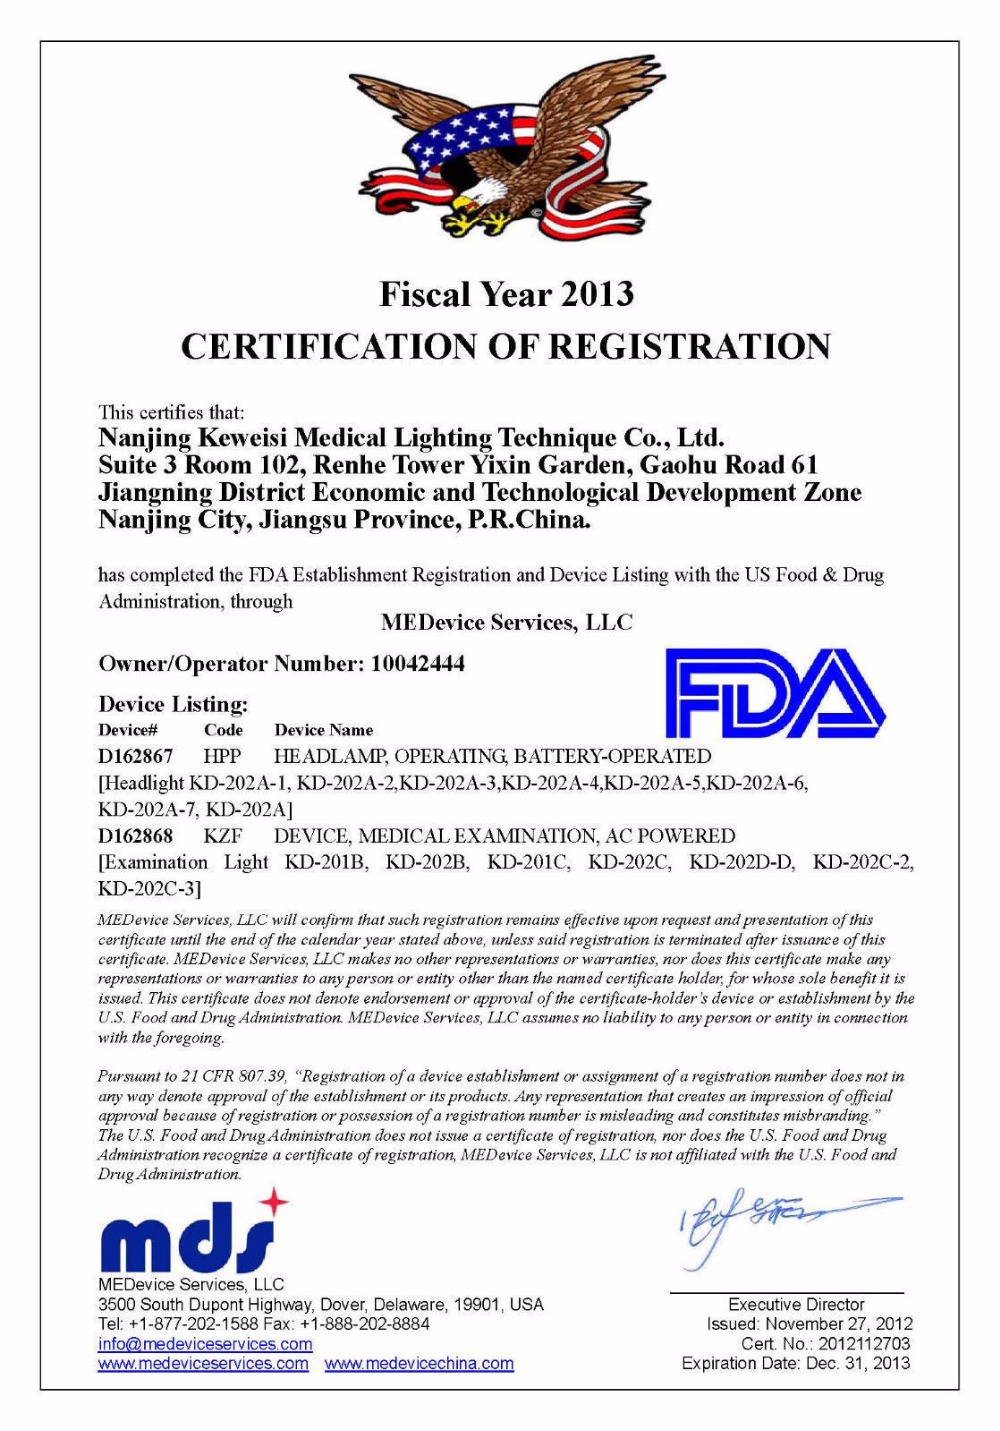 5W 80000lx LED Surgical Headlight High-power Medical Dental Head Lamp FDA NQA KD-202A-6